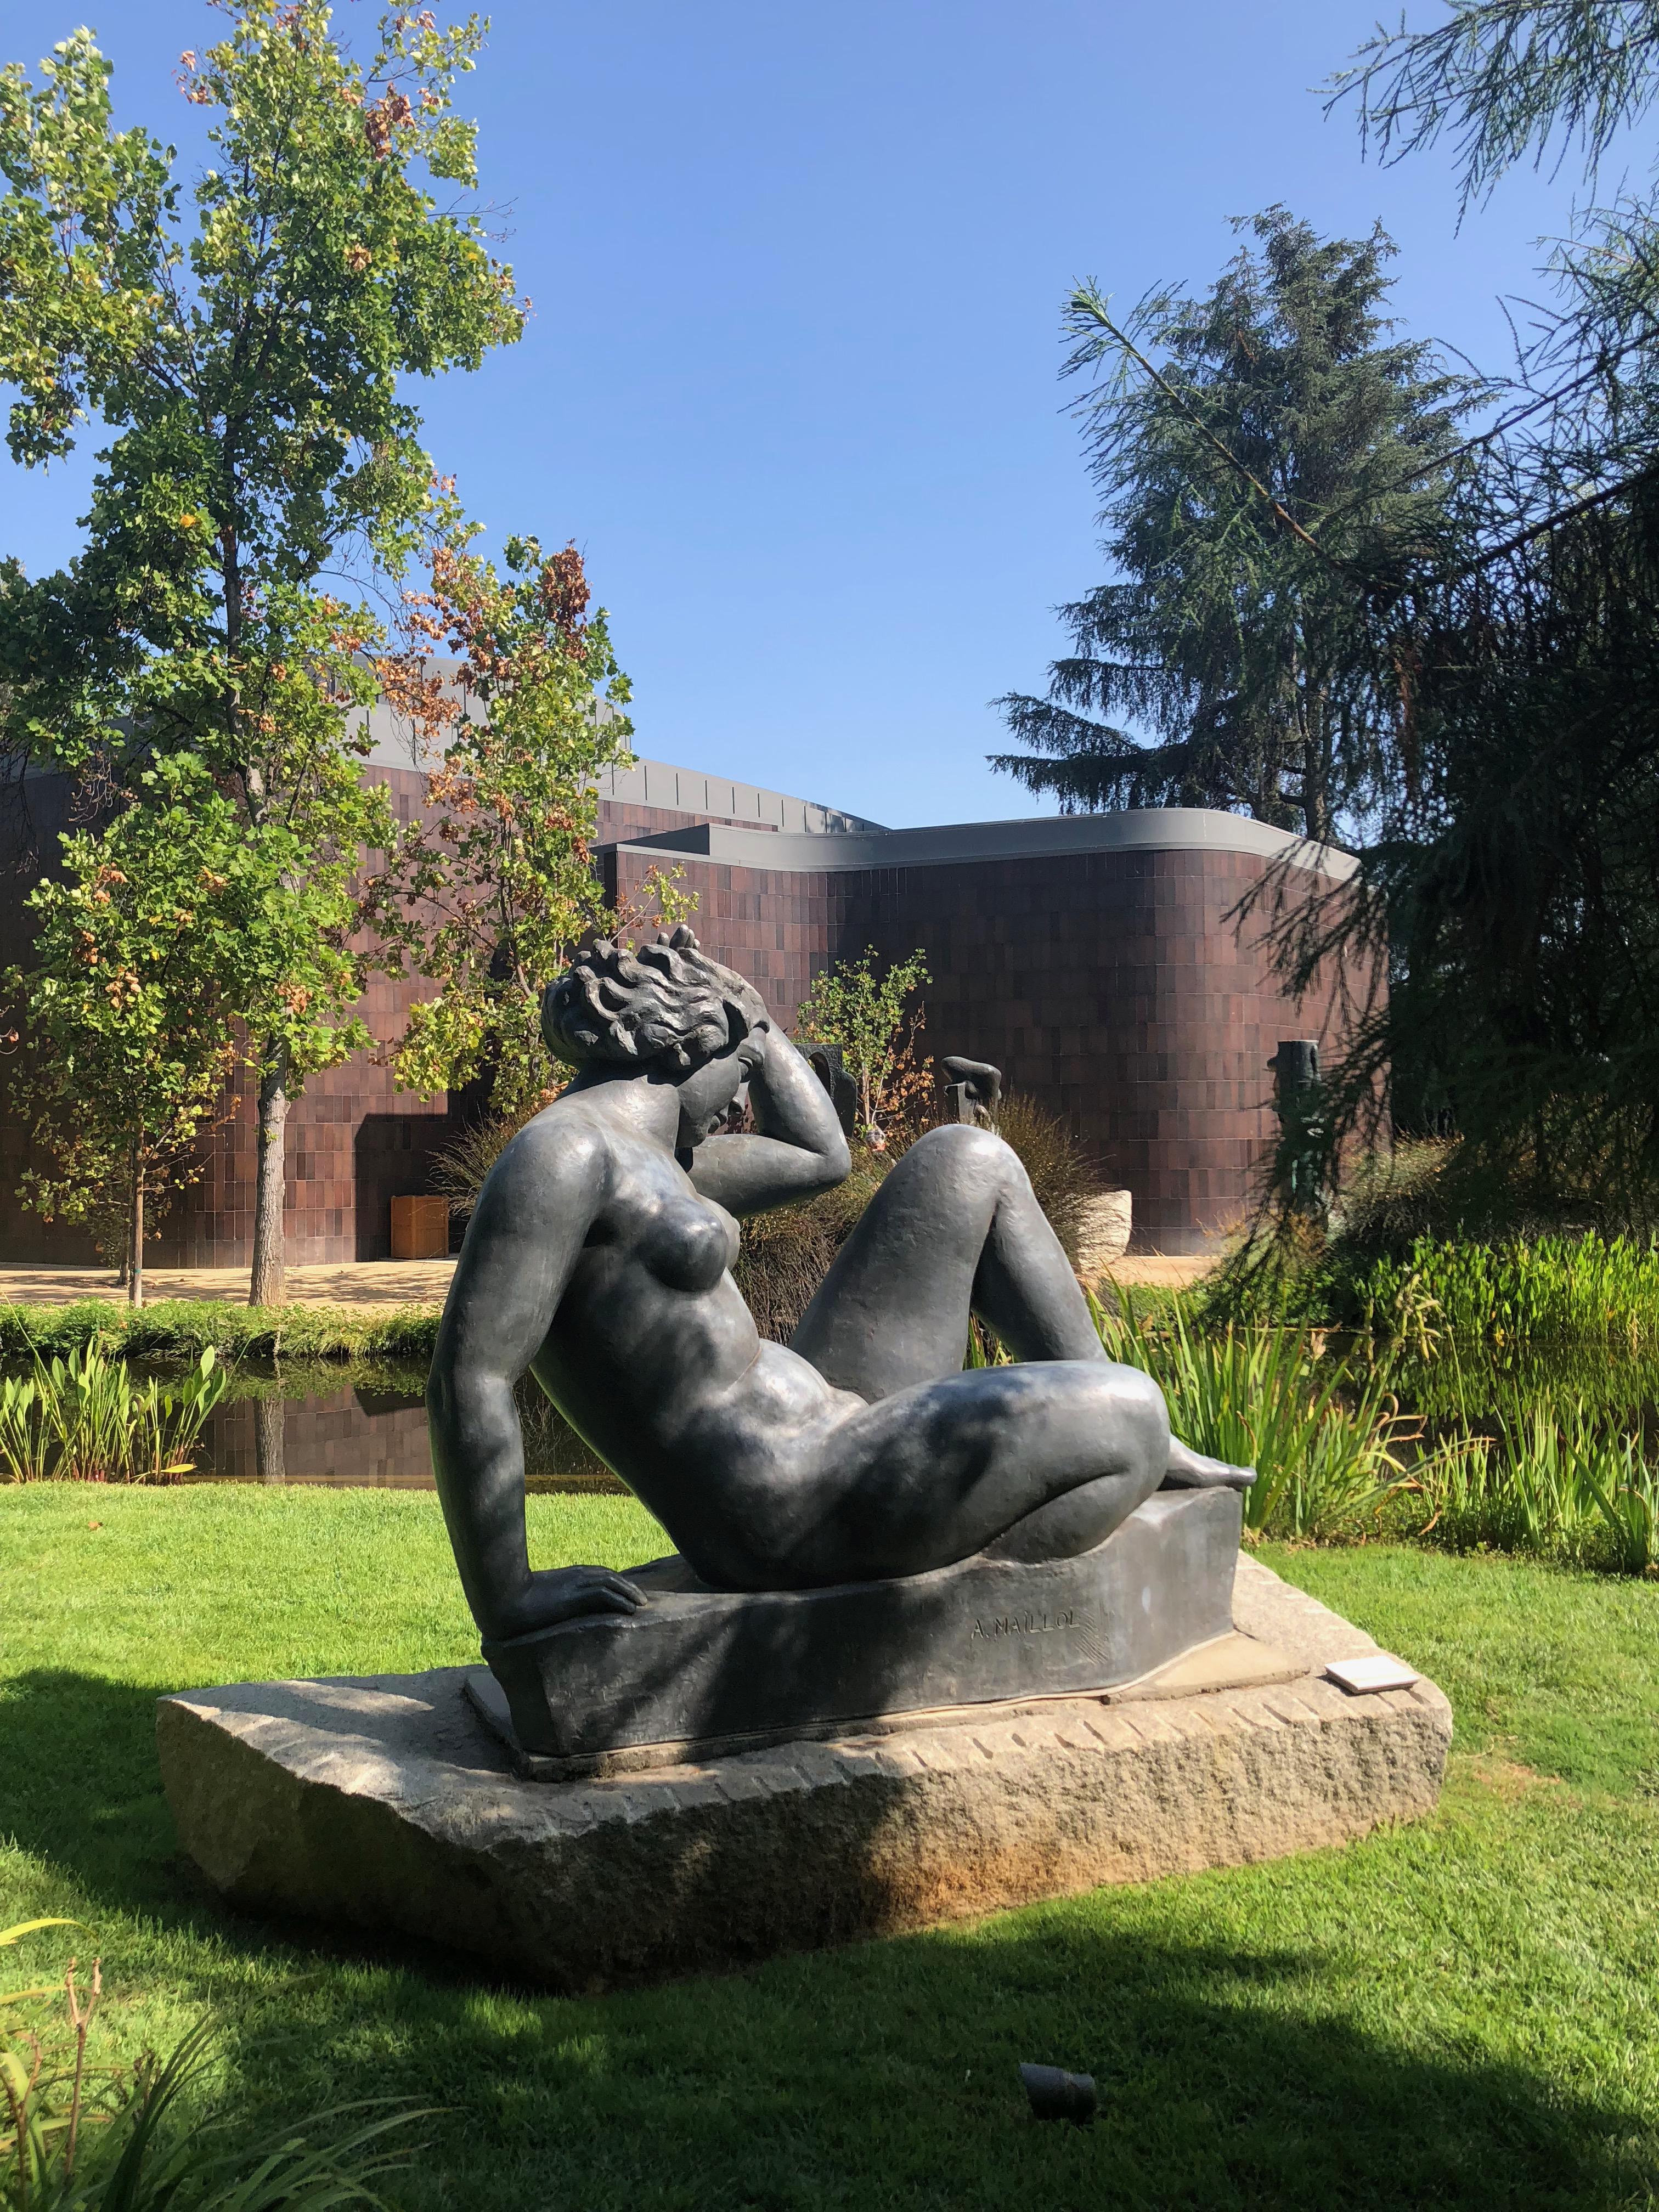 Norton-Simon-museum-statue-garden.jpg?mtime=20180823164608#asset:103043